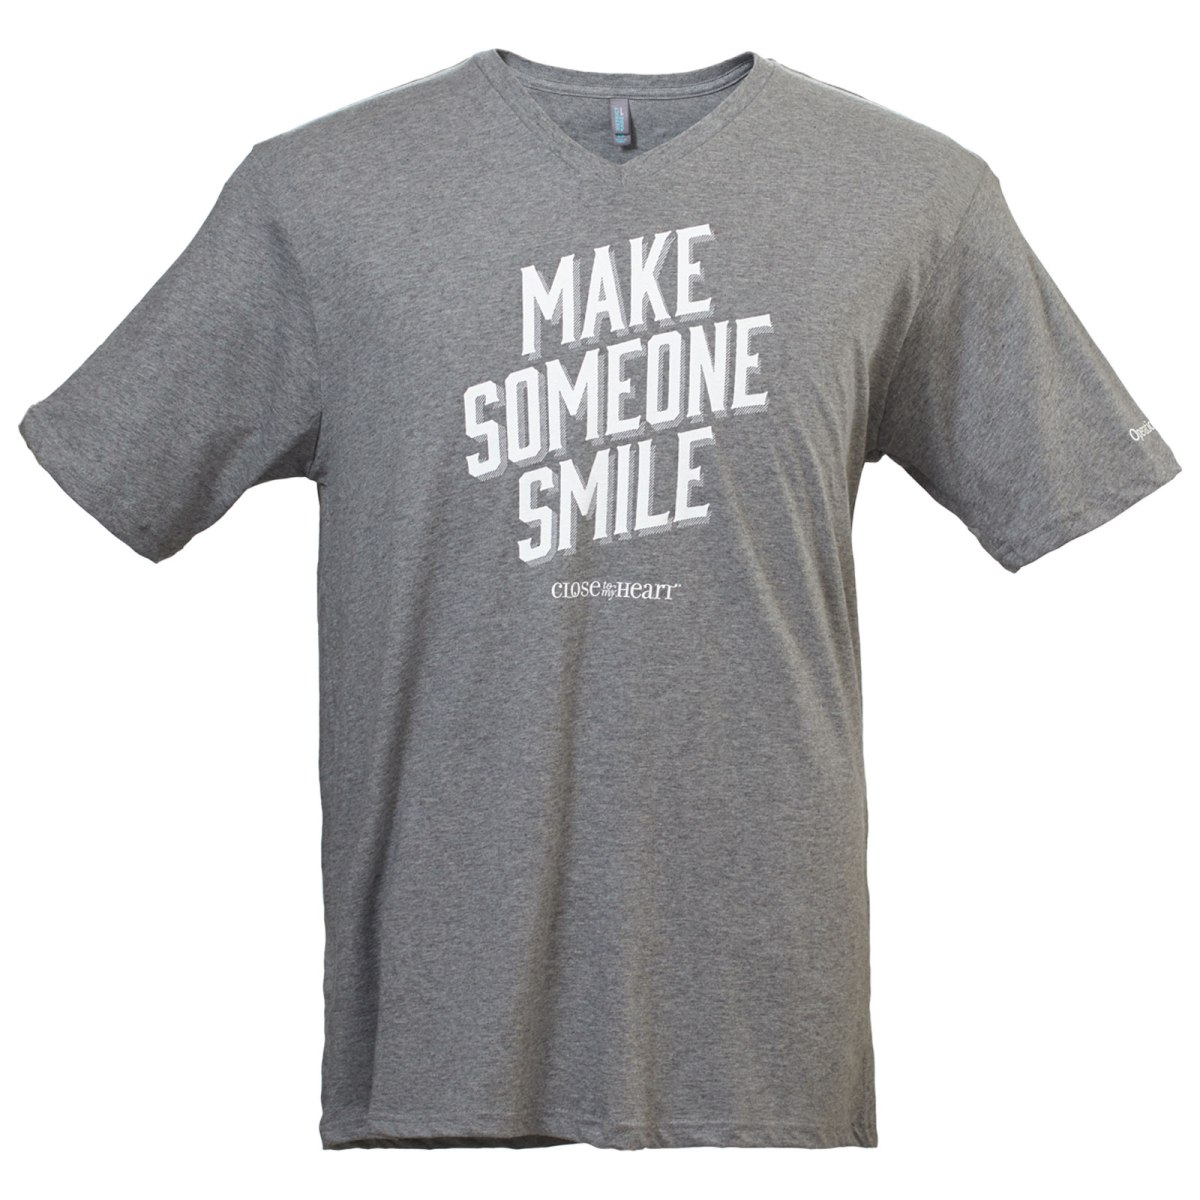 Support Operation Smile by buying one of these shirts! #ctmh #CloseToMyHeart #OperationSmile #operationsmile #makesomeonesmile #donate